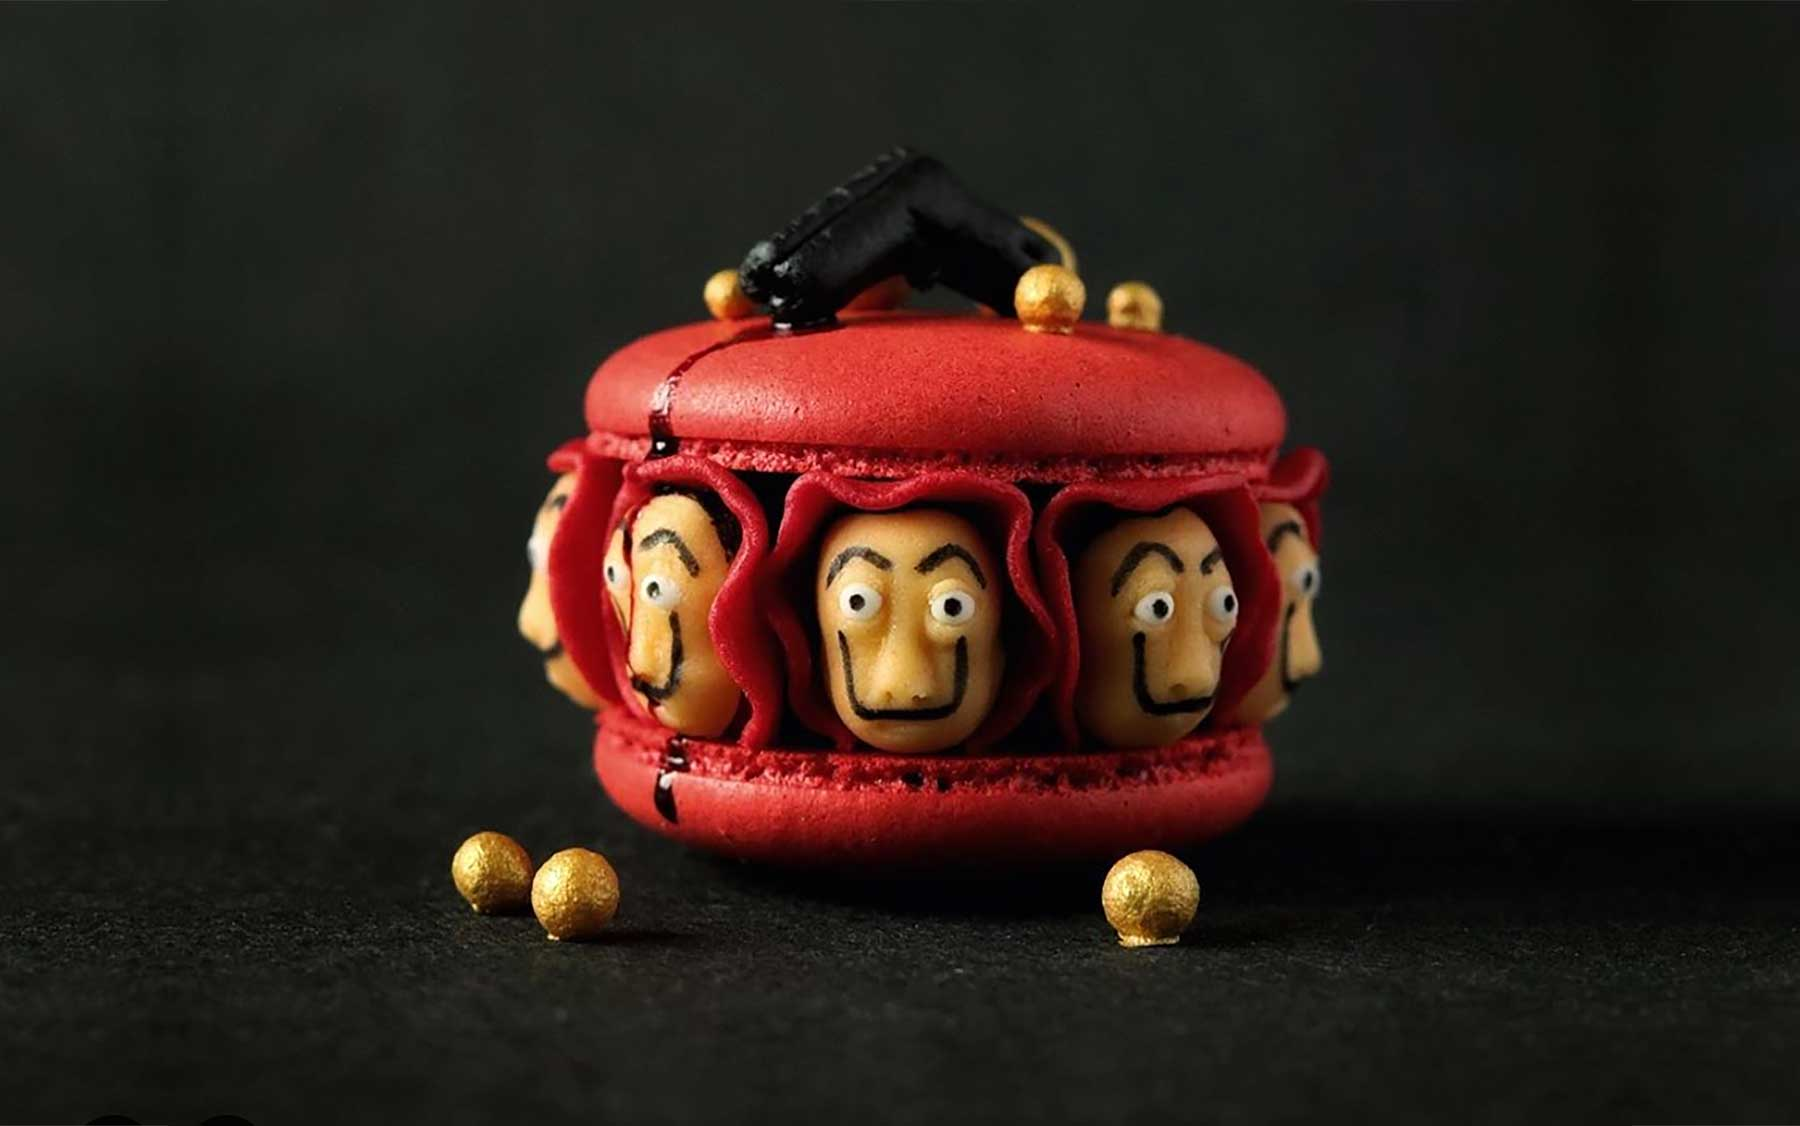 Ausgefallene Macarons aus kims_bachstuebli